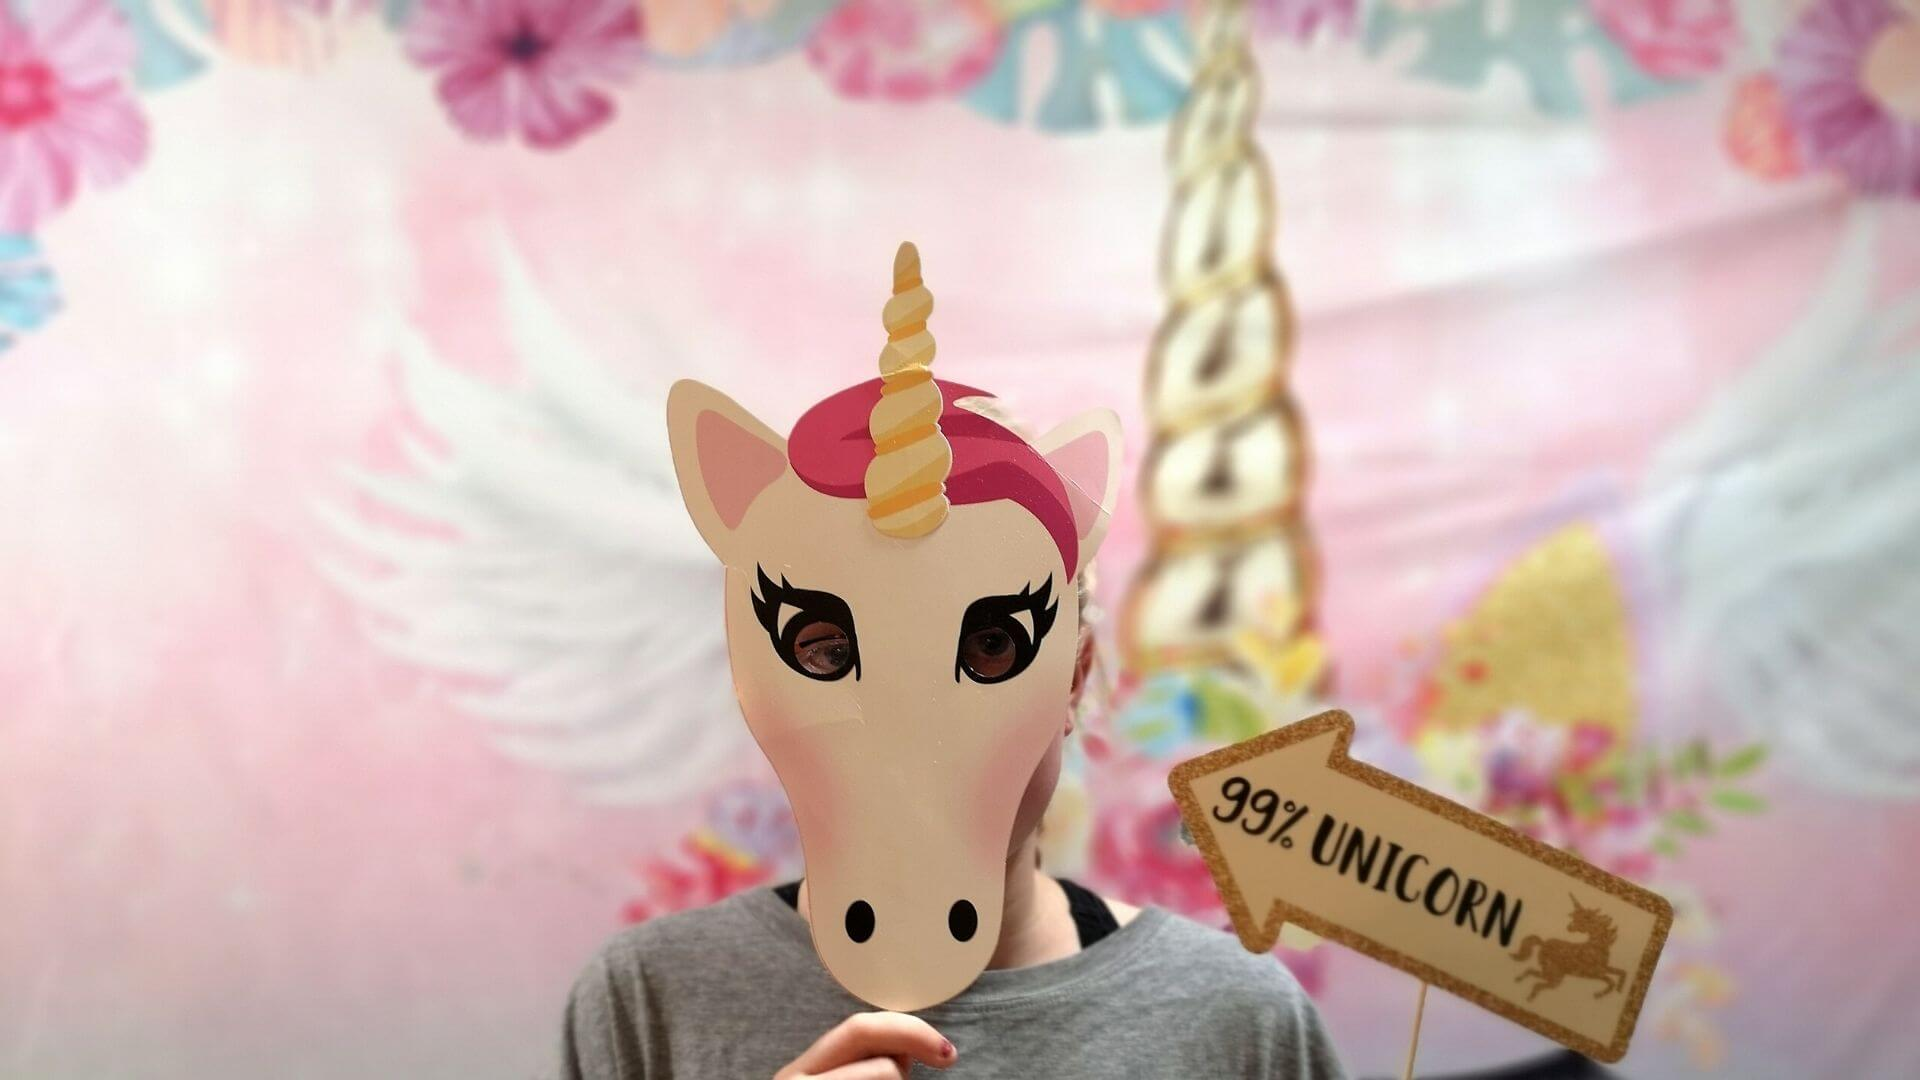 Unicorn photo booth